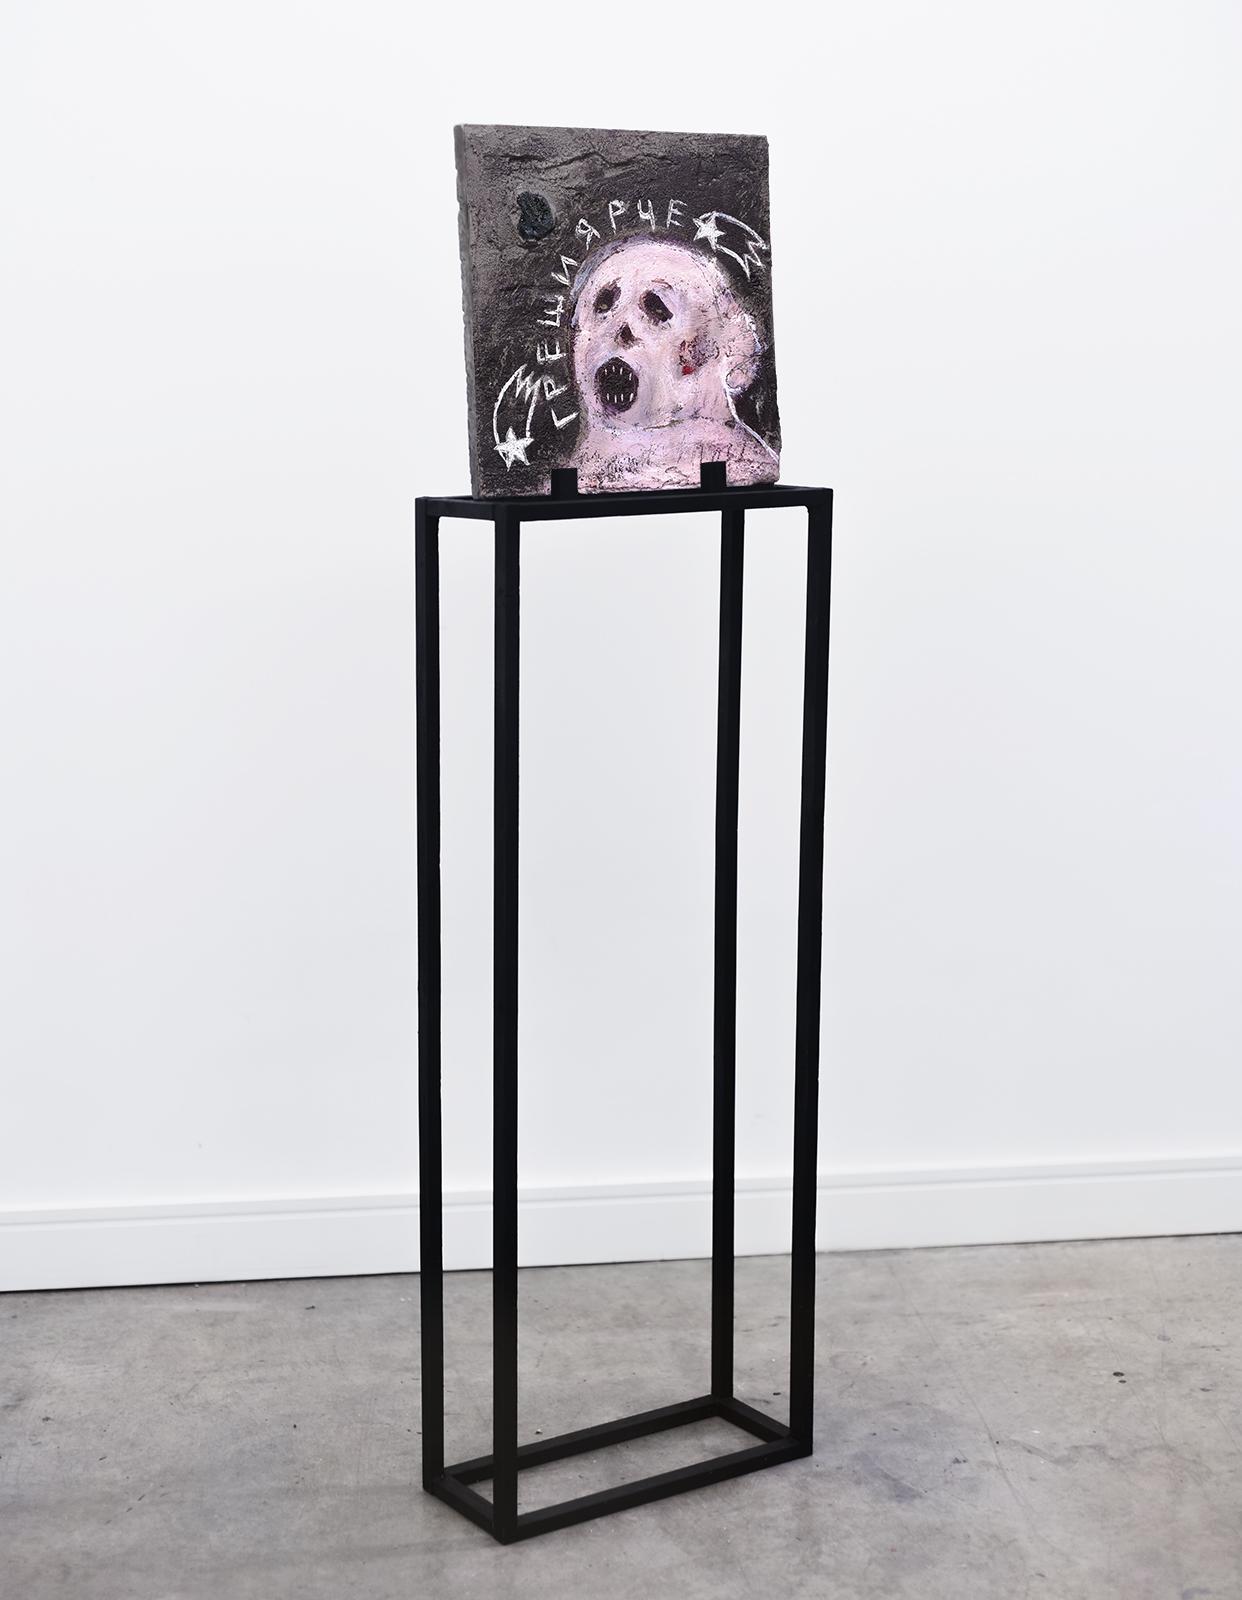 Greshy yarche (Sin brighter) , 34 x 34cm, quartz geode, acrylic, spray paint and oil pastel on concrete panel, 2018